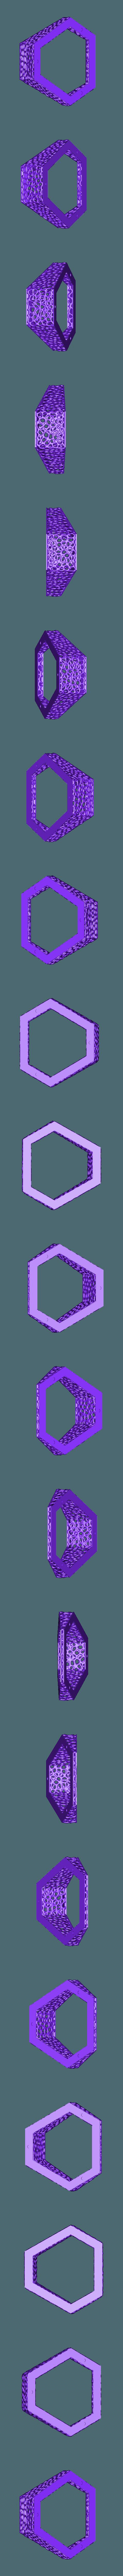 Part Voronoi.stl Download free STL file Concrete Planters Mold • 3D print model, dukedoks